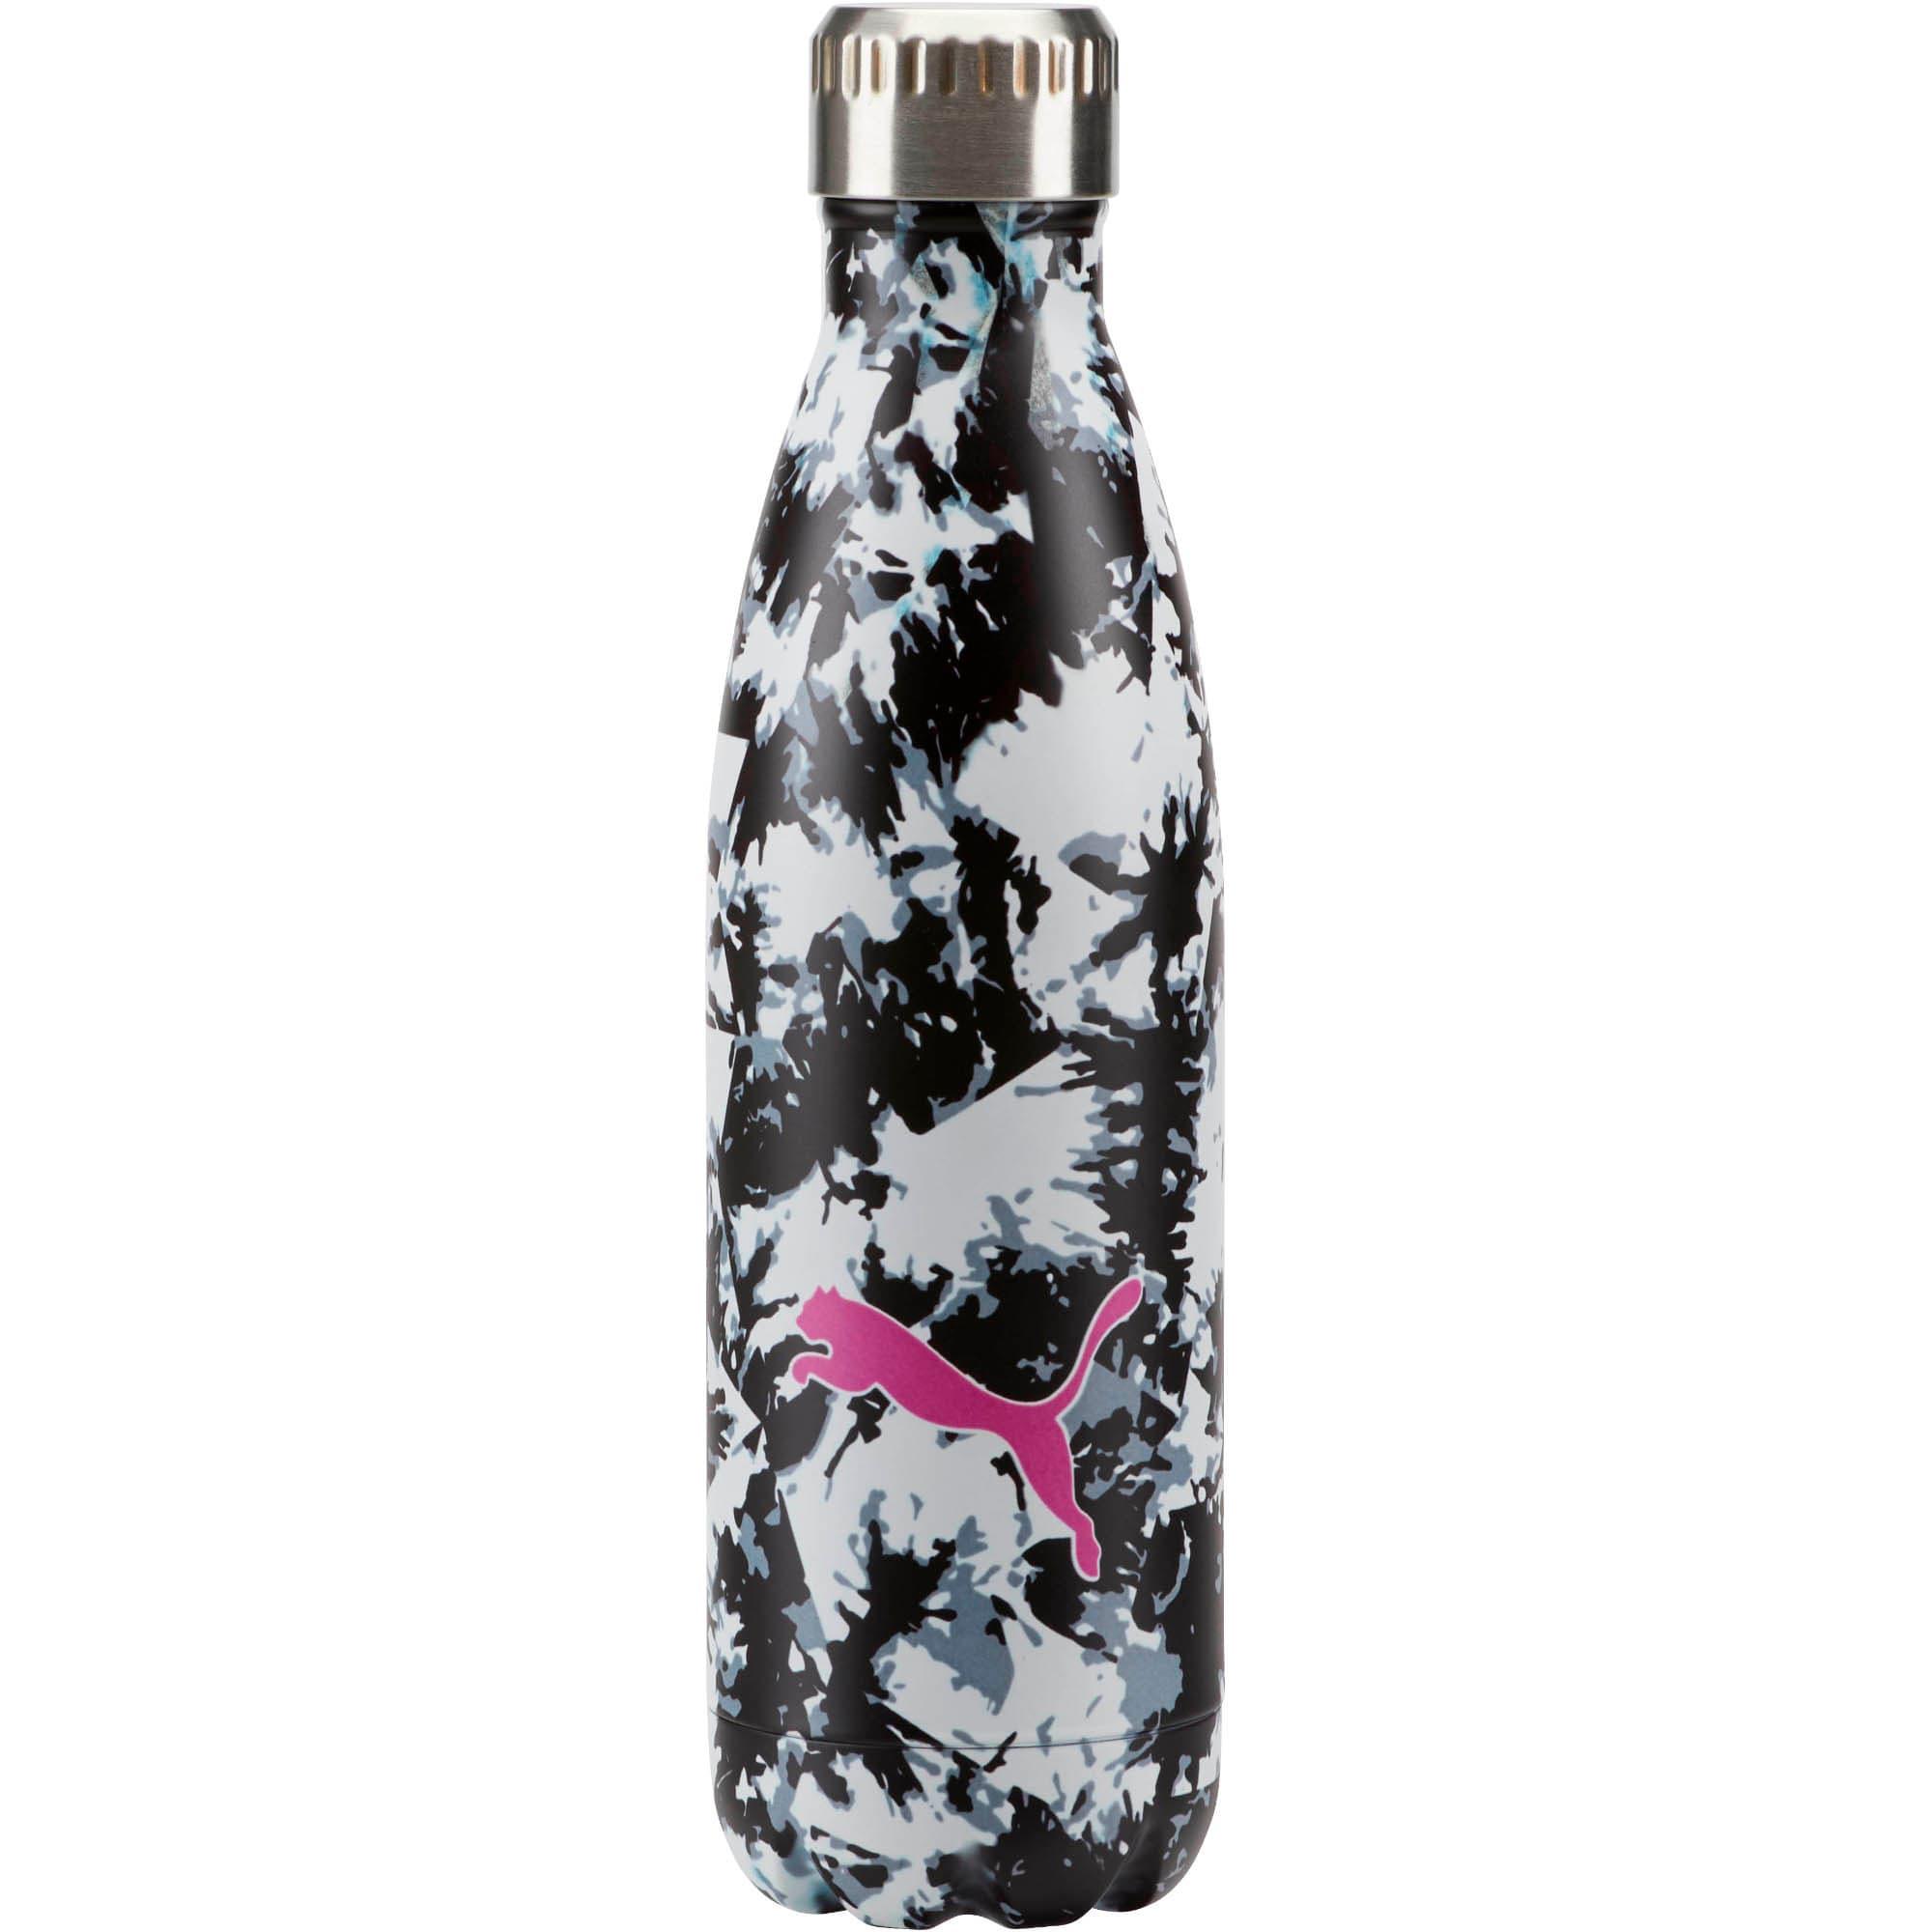 Thumbnail 1 of PUMA Chroma Vacuum Stainless Steel 17 oz. Water Bottle, Black White Camo, medium